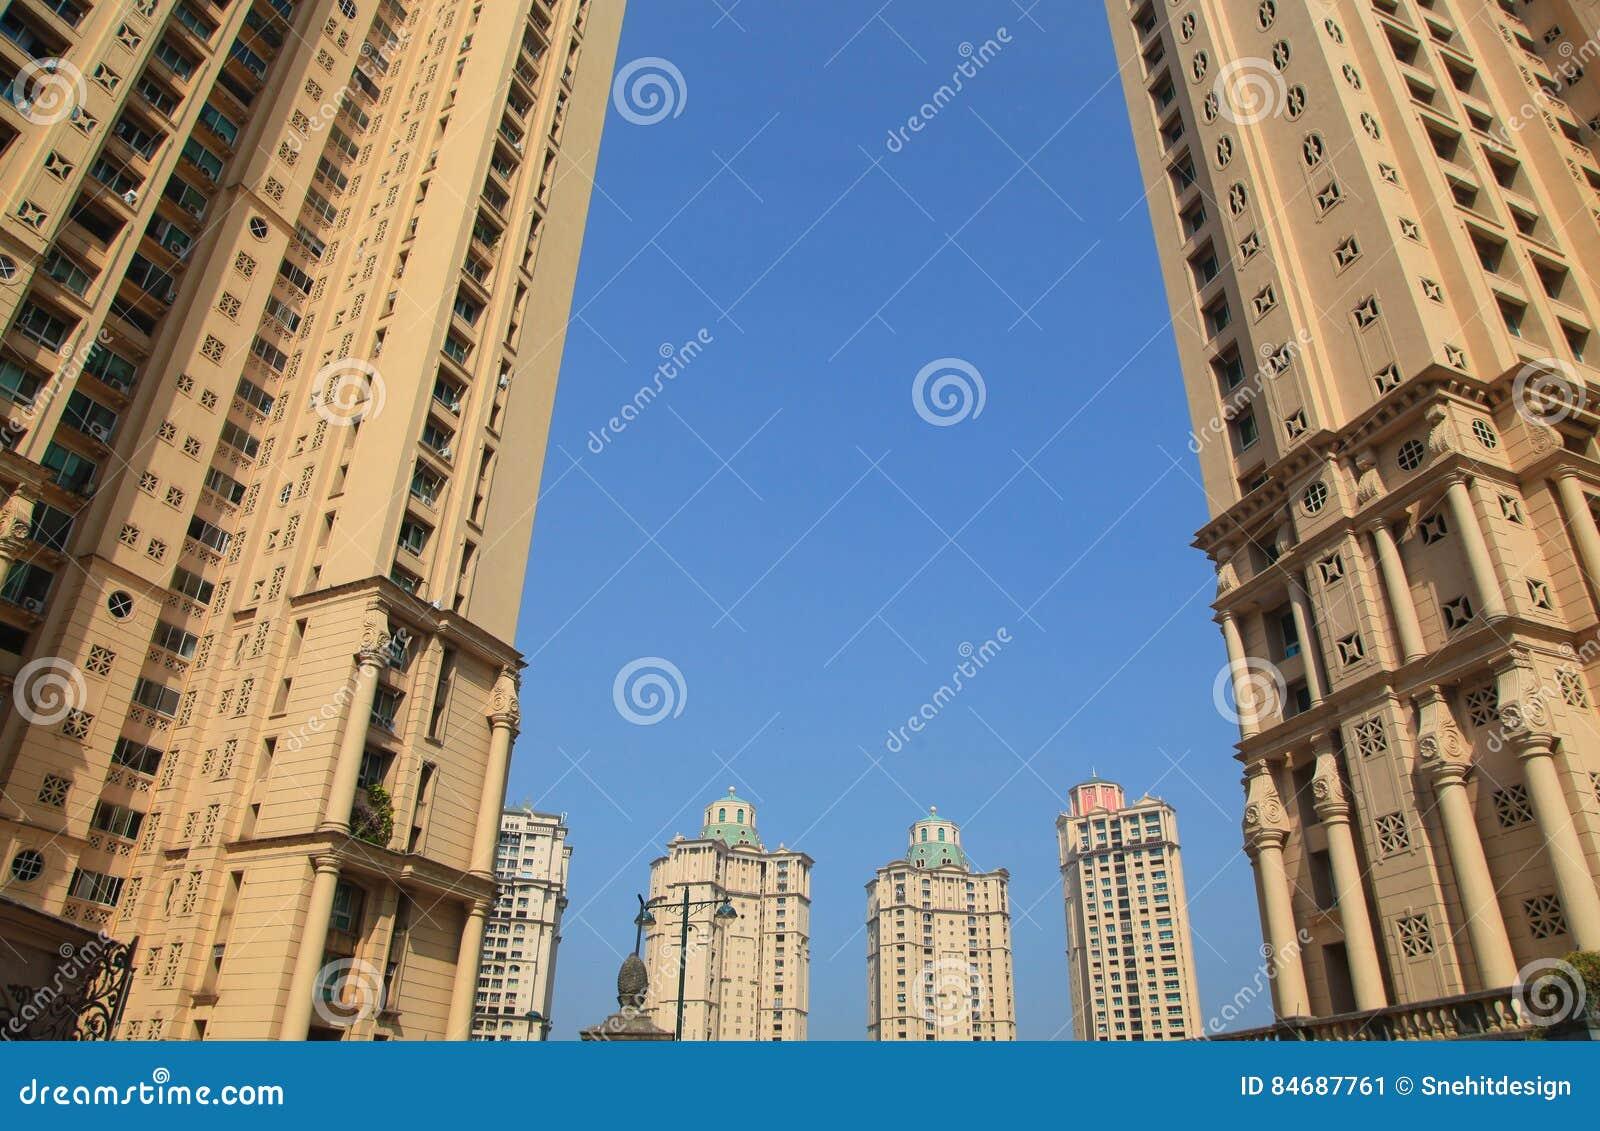 high rise modern residential buildings in mumbai stock image image